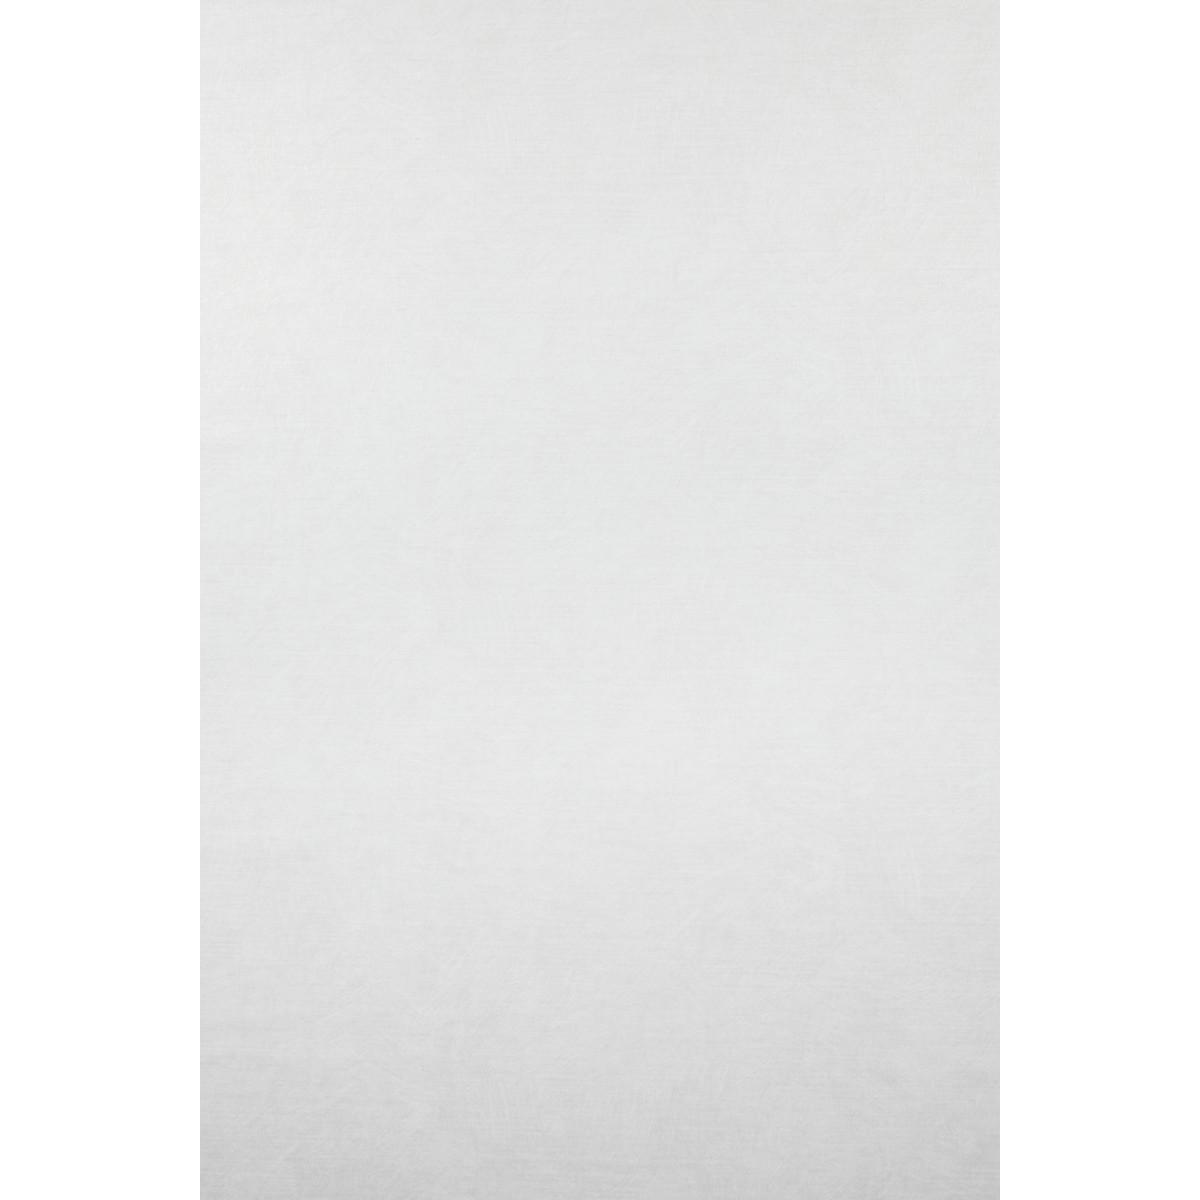 Обои флизелиновые Startdeco Амарона бежевые 1.06 м 998852